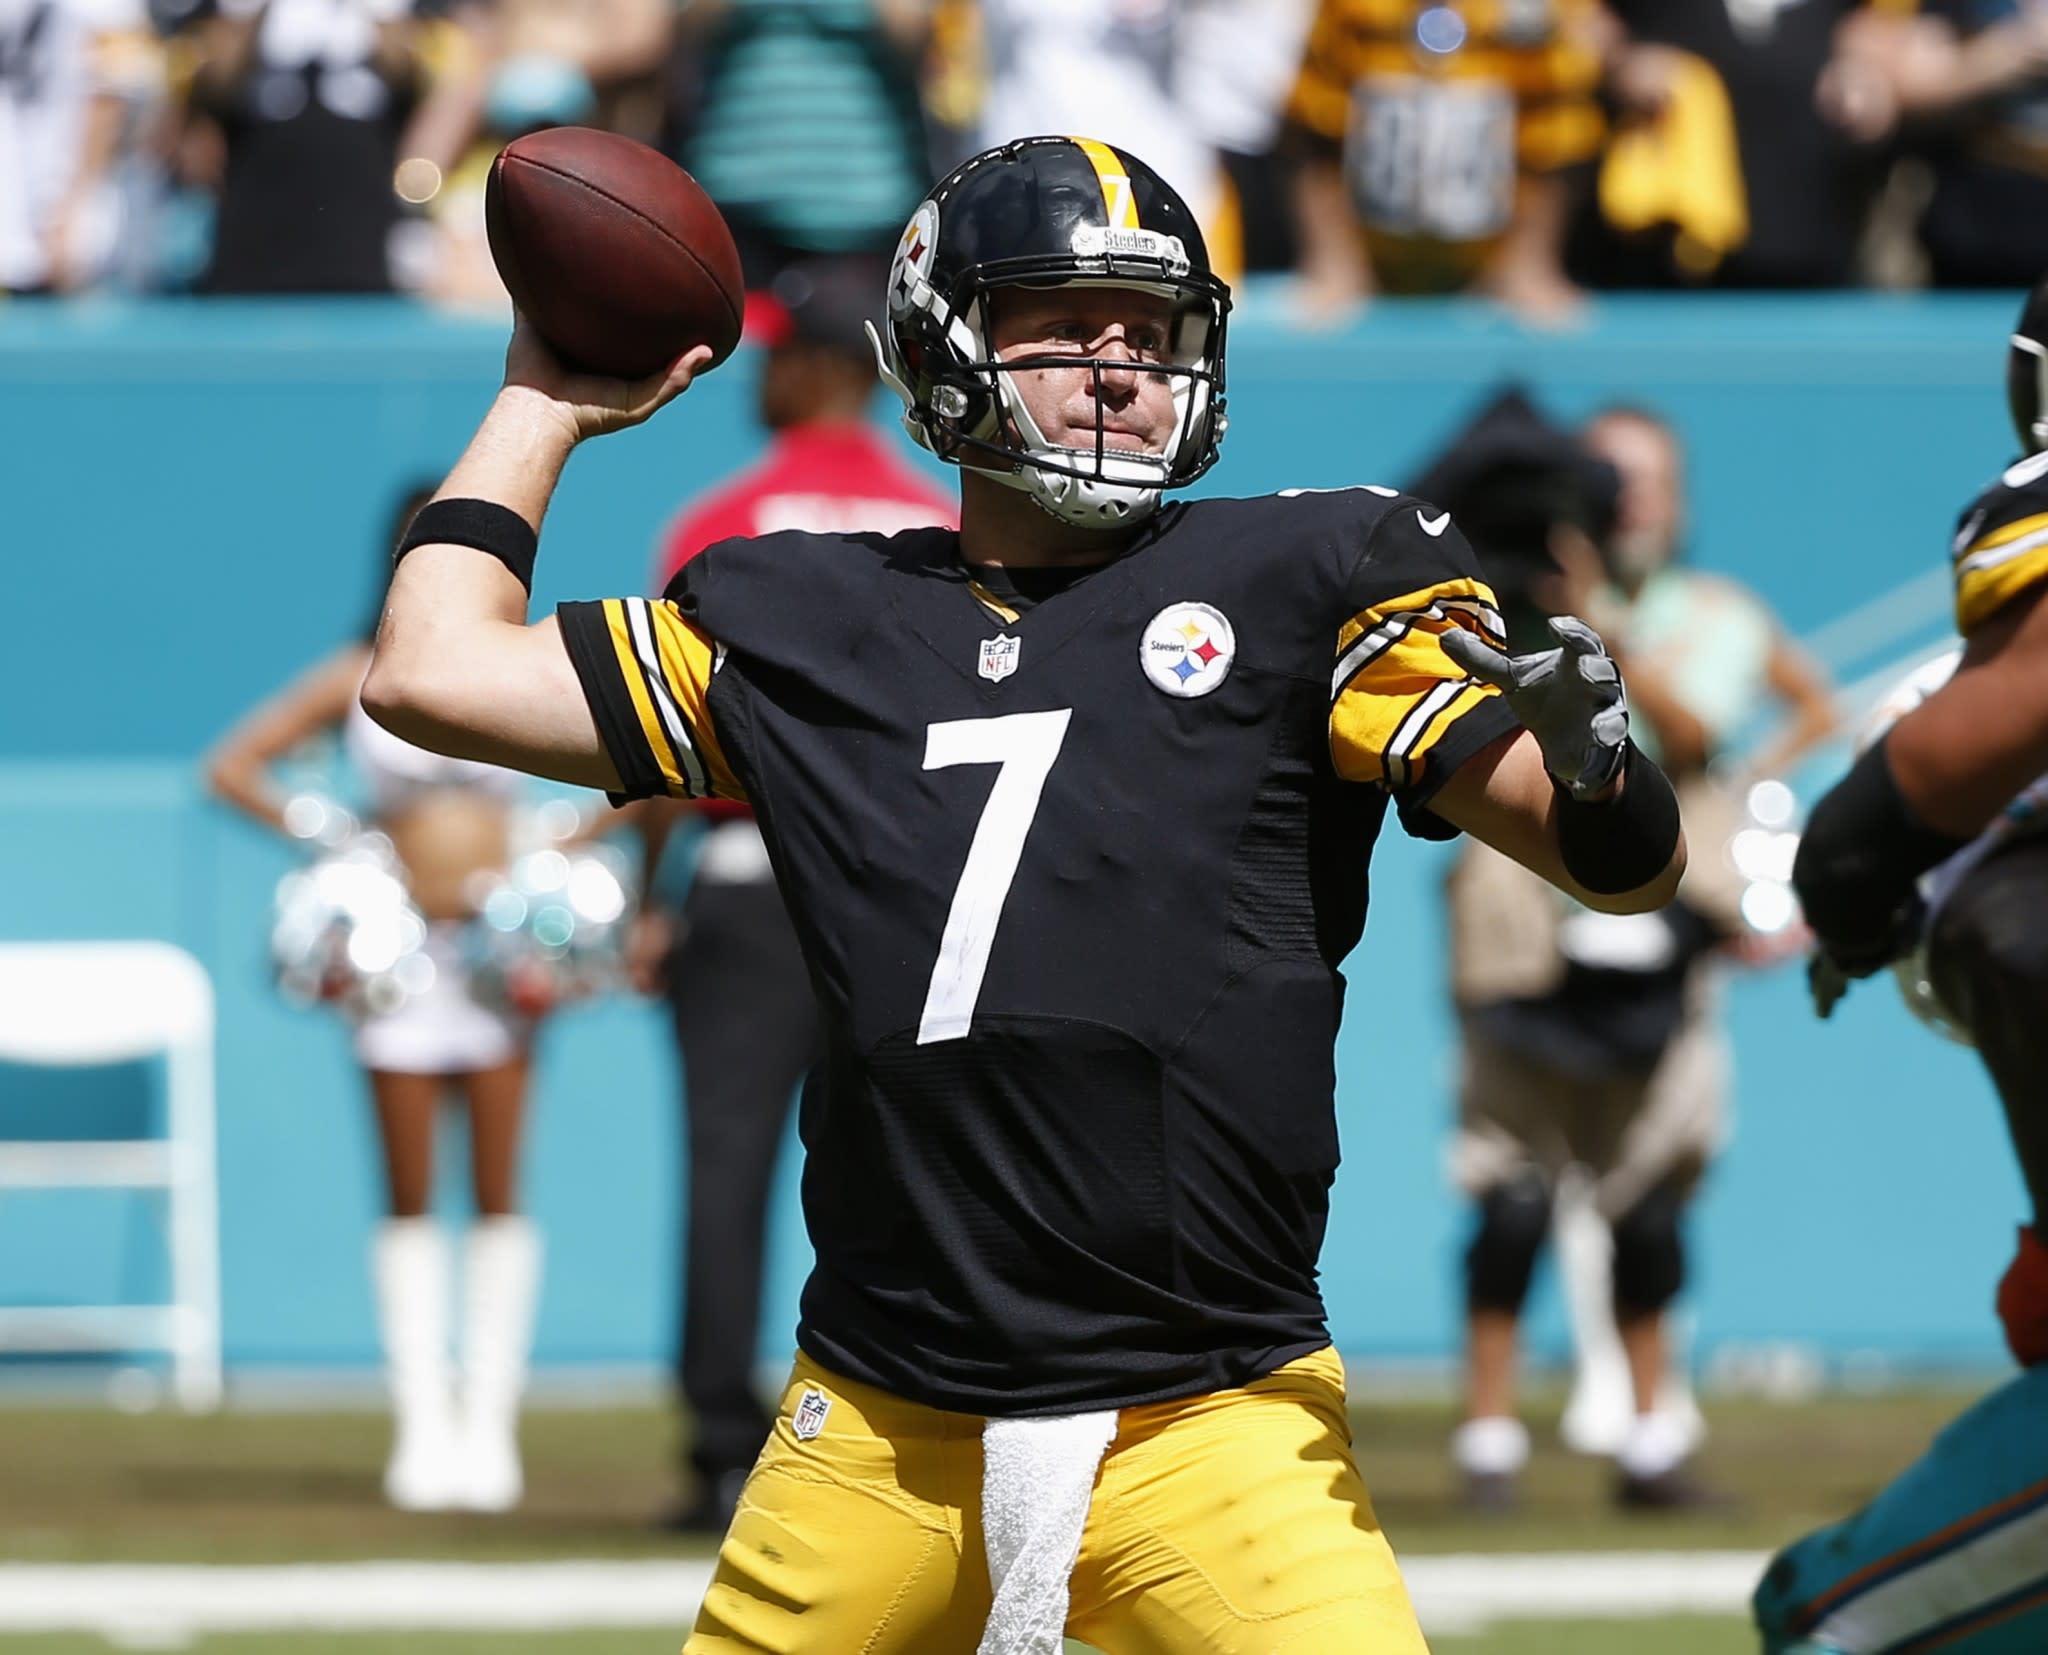 Report Steelers Ben Roethlisberger has torn meniscus will be